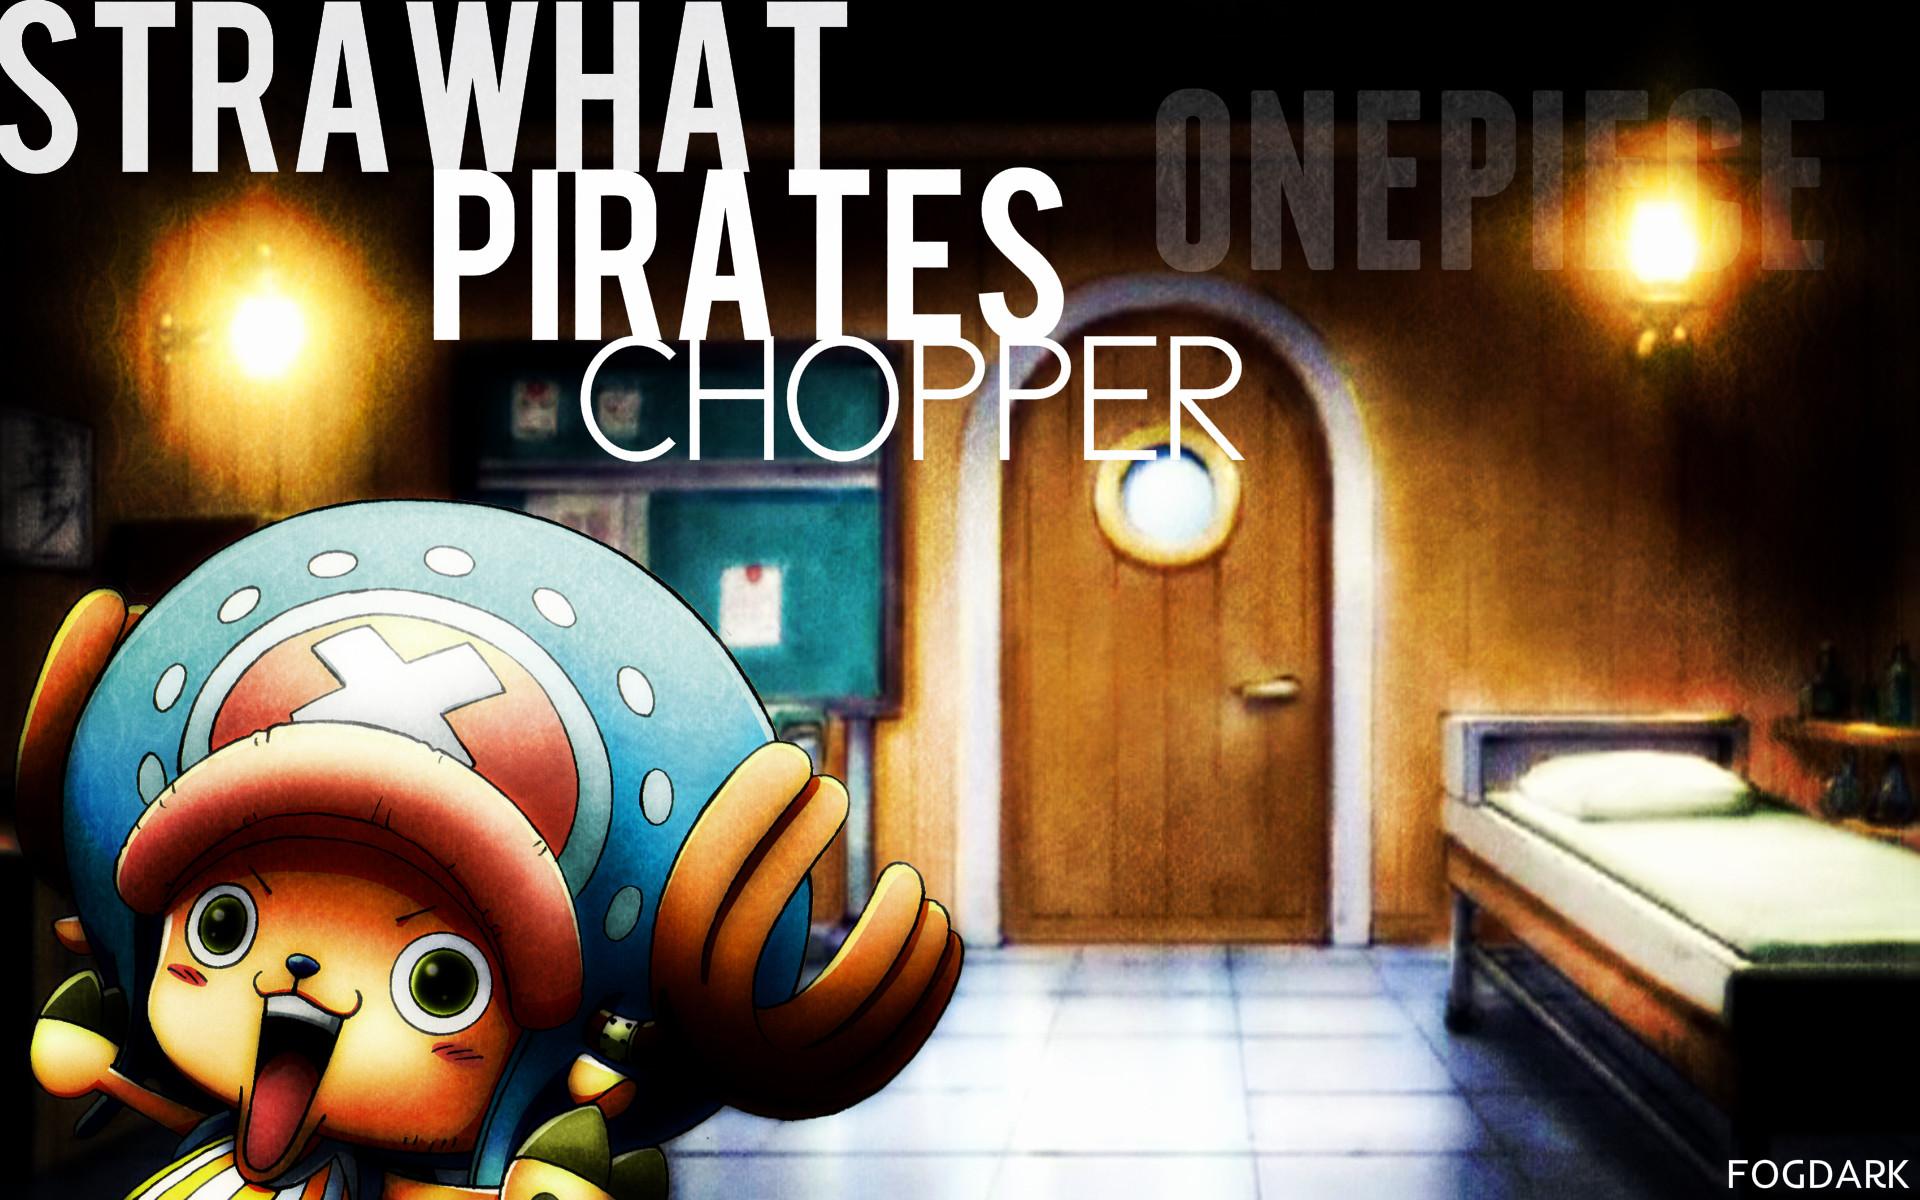 … straw_hat_pirates__franky__by_fogdark-d5w7qjt  straw_hat_pirates__chopper__by_fogdark-d5wf7cl  straw_hat_pirates__brook__by_fogdark-d5wv2tq